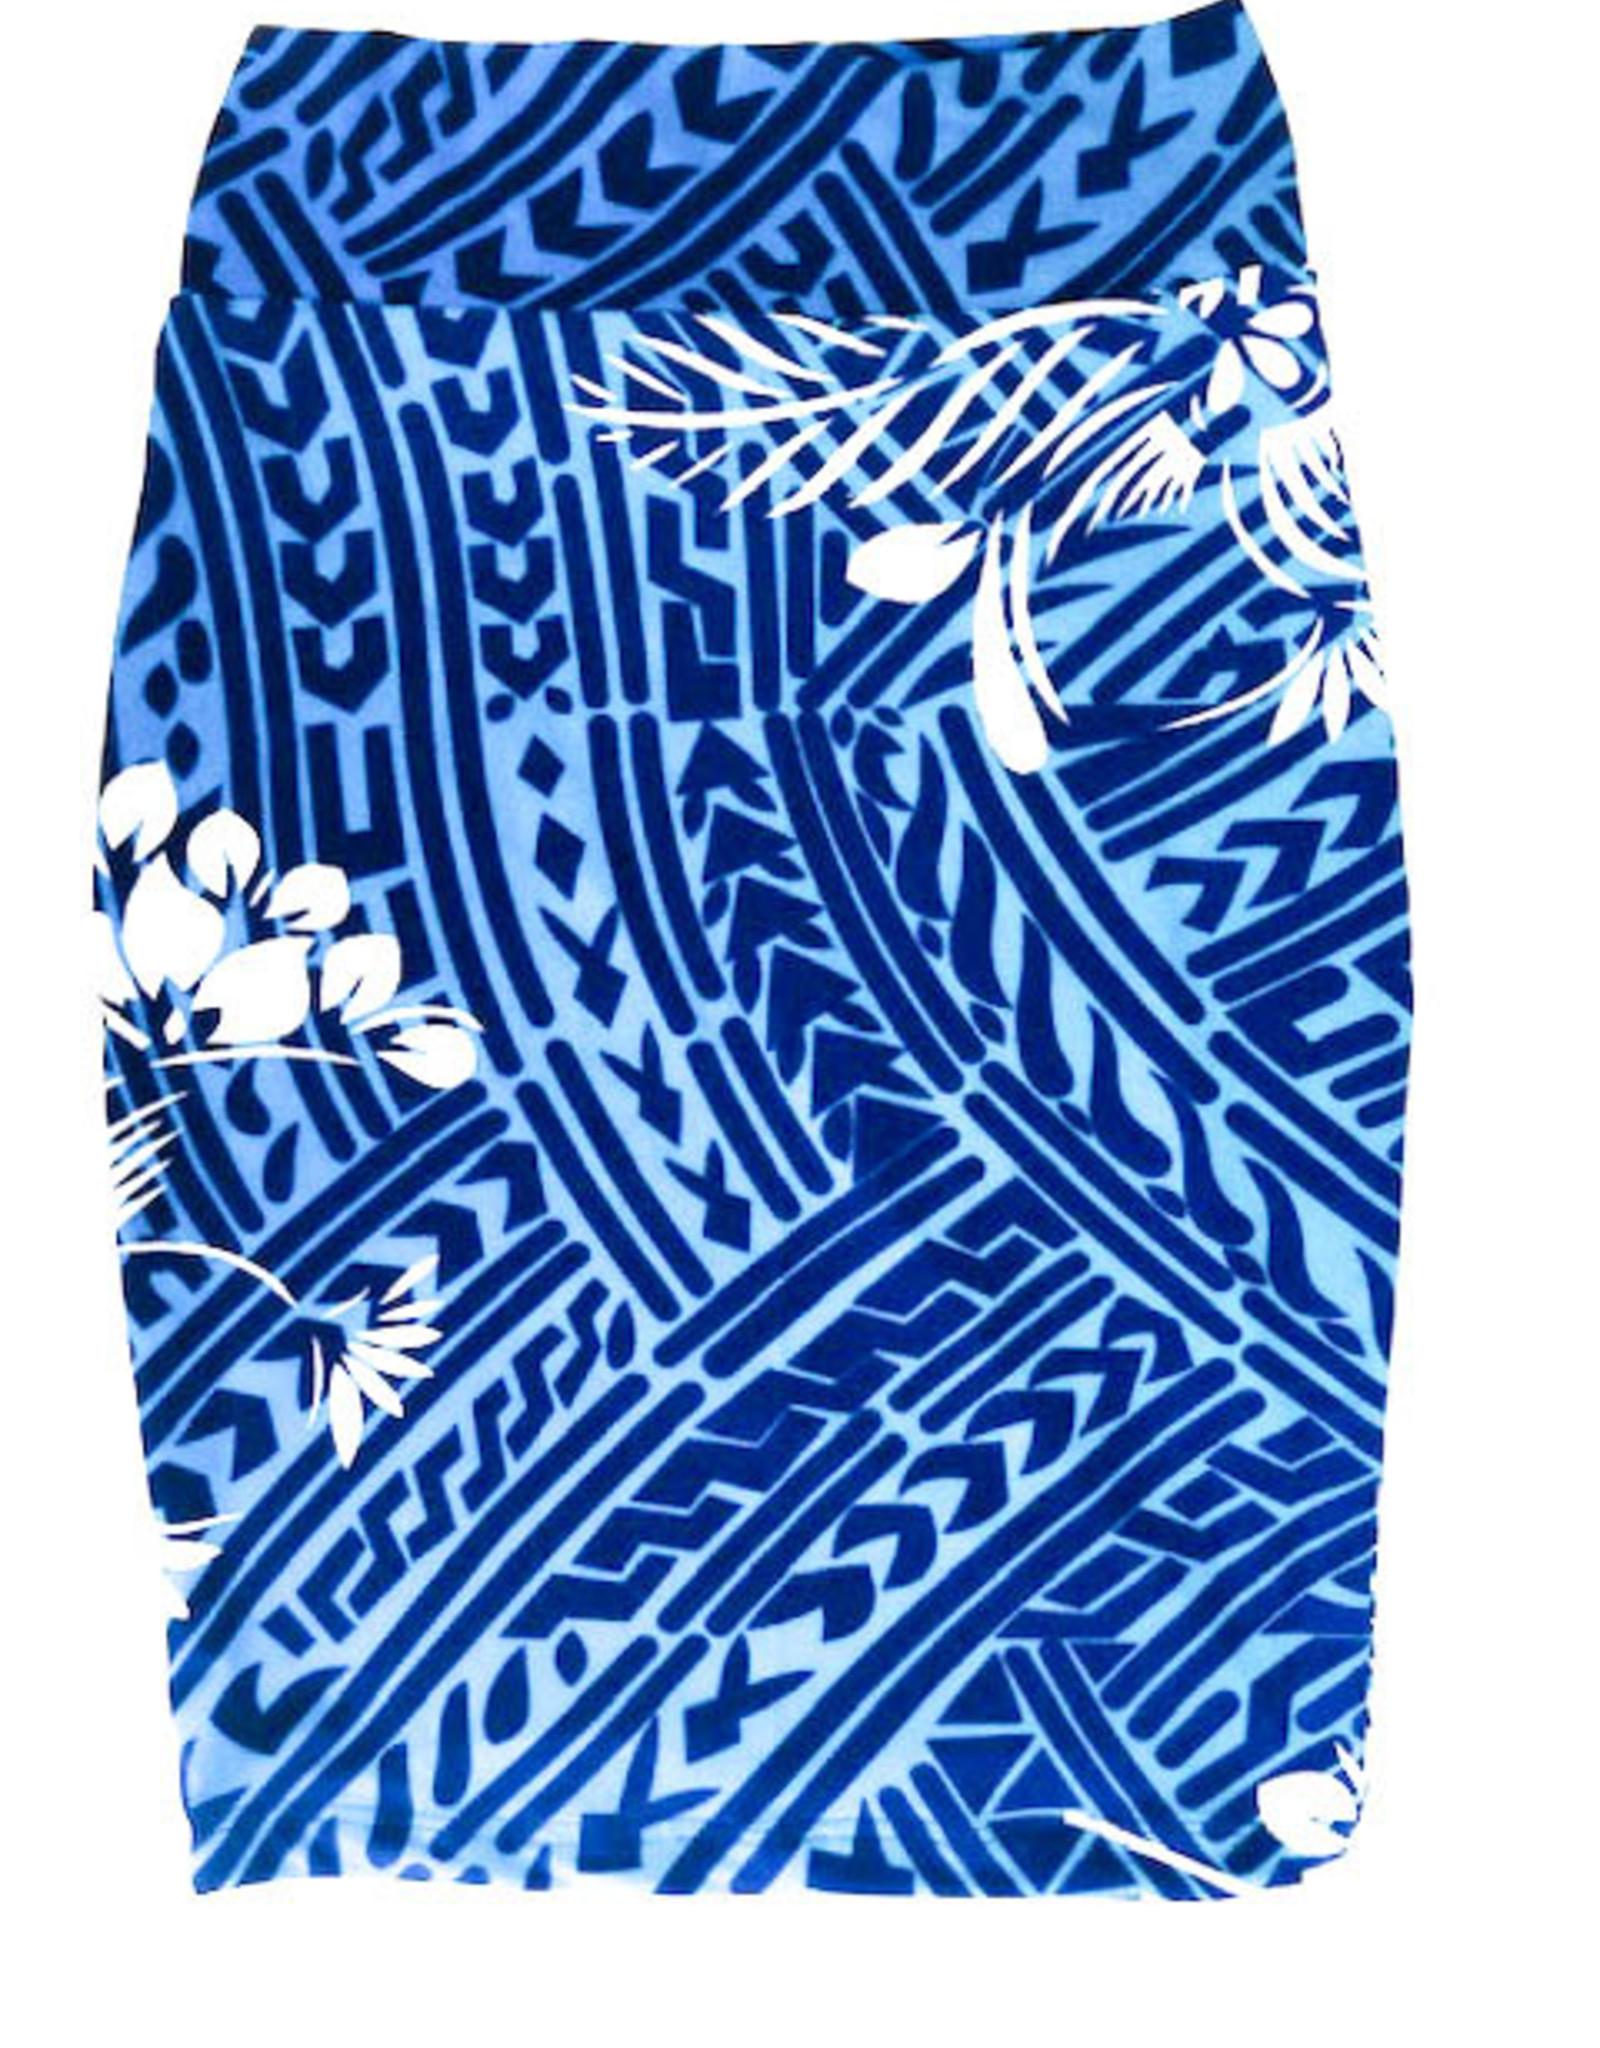 Short Stretch Pencil Skirt